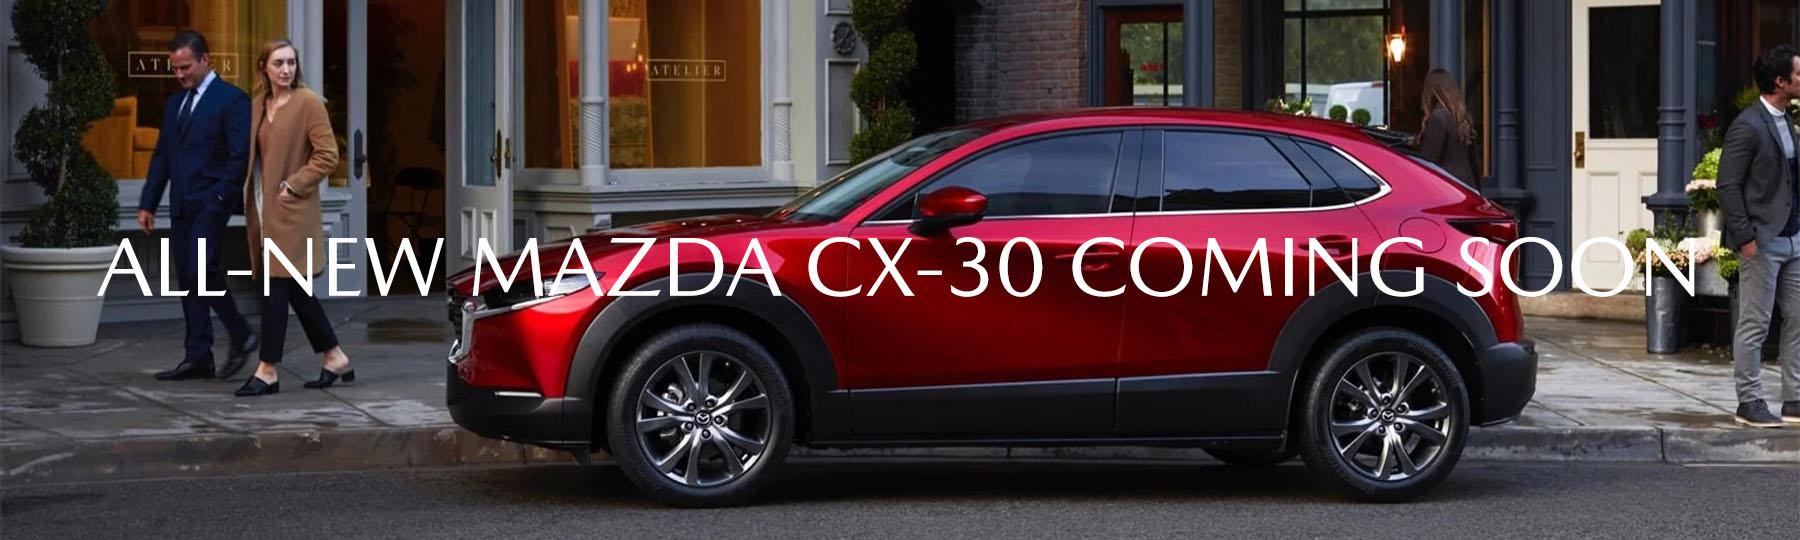 Mazda CX-30 Coming Soon